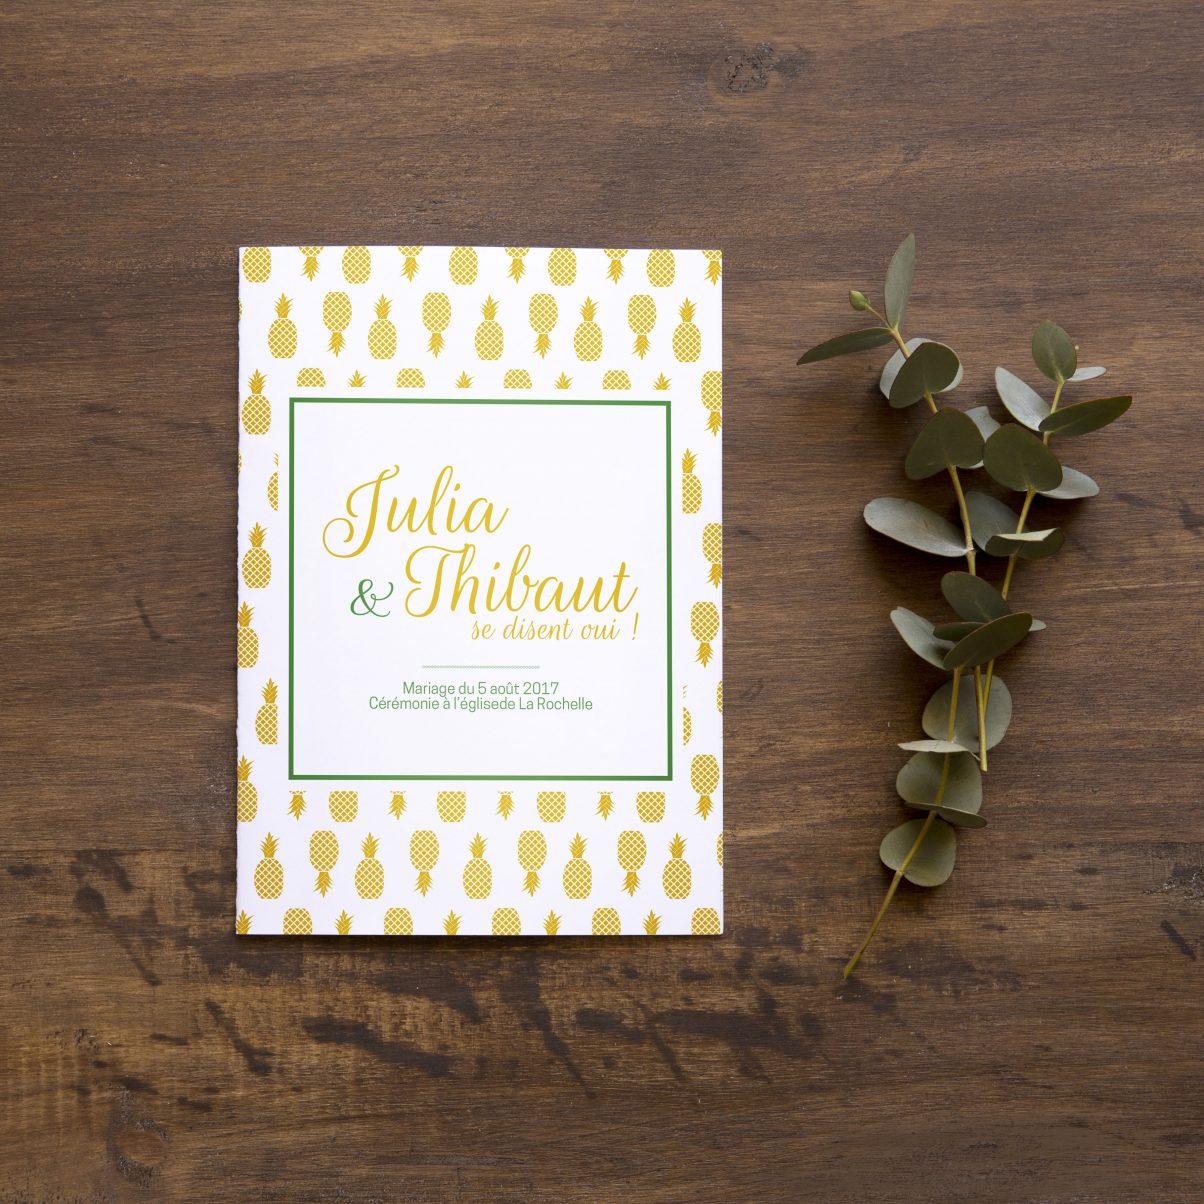 Livret de messe - Mariage - Julia & Thibaut - 1er - OK